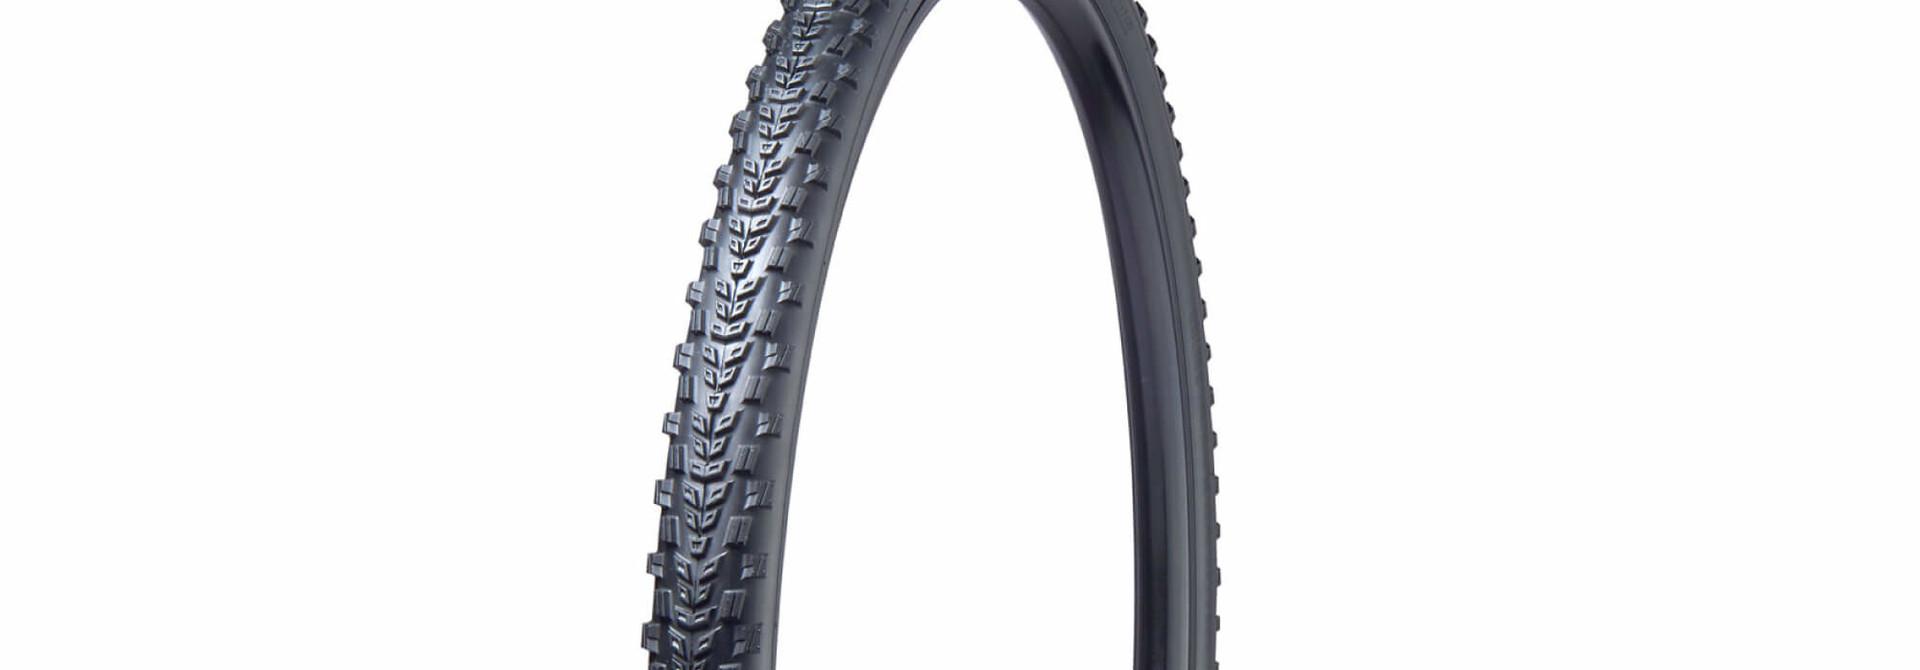 Rhombus Pro 2BR Tire